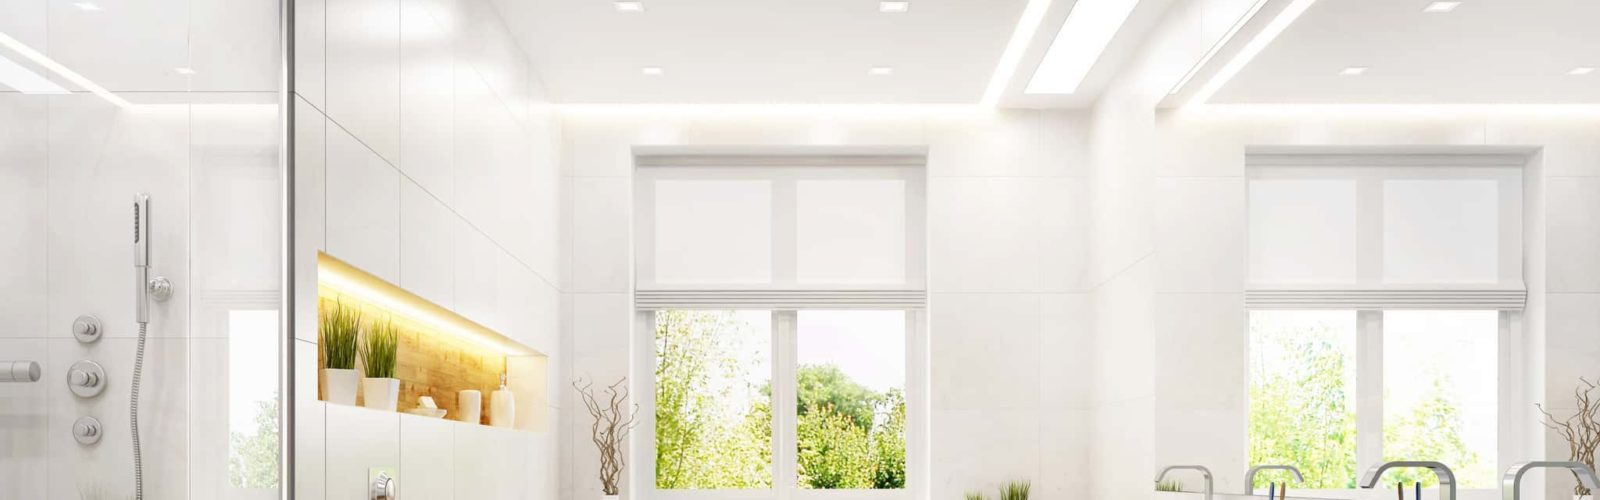 Fenster in hellem Badezimmer